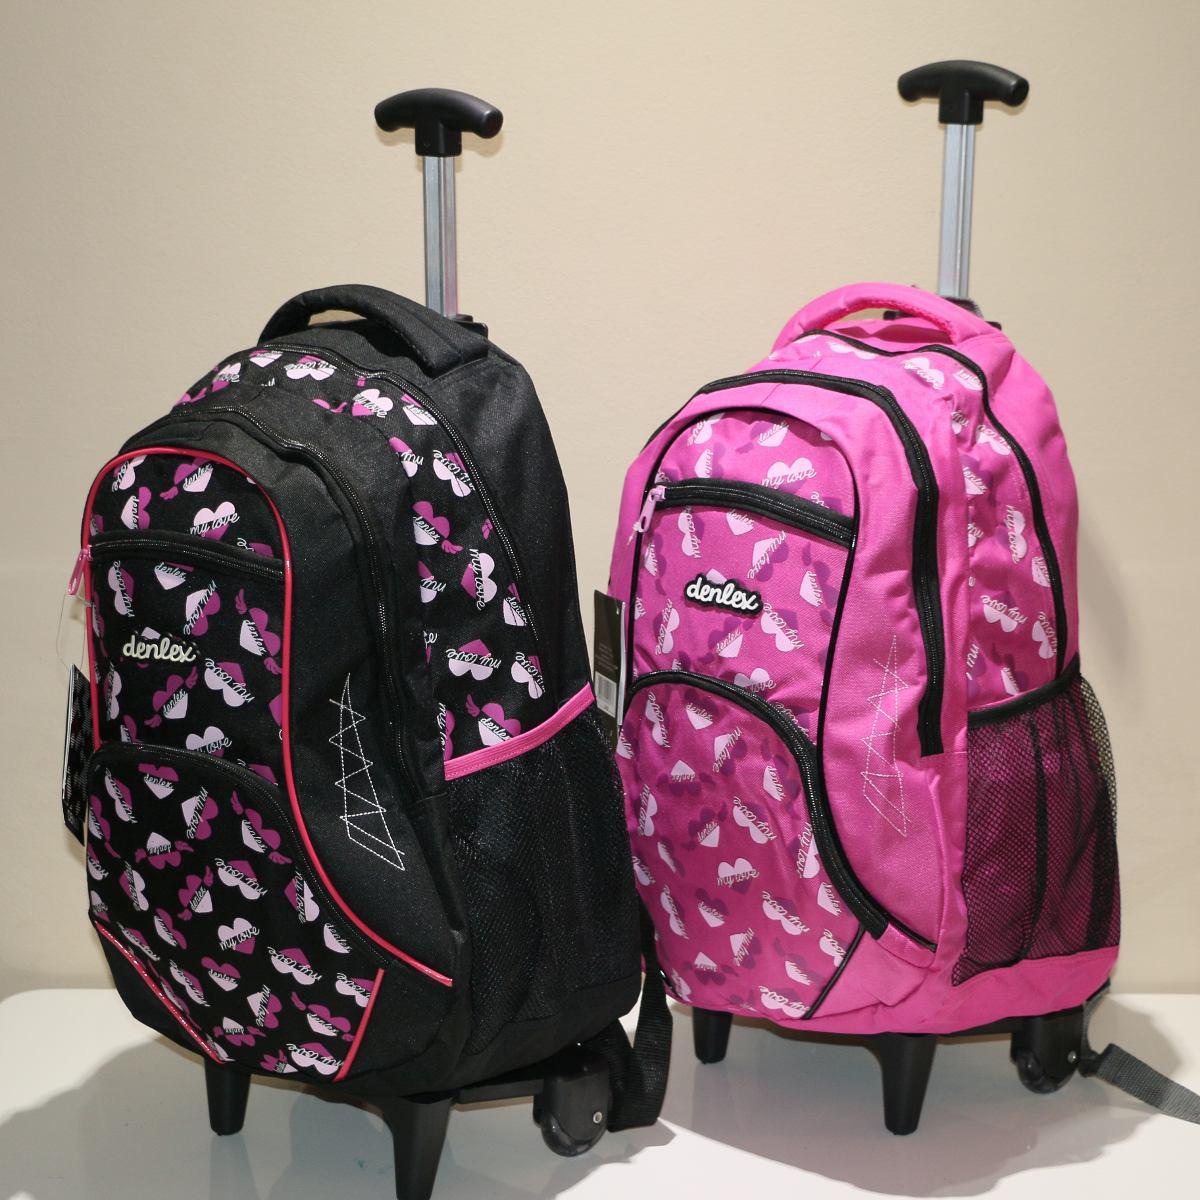 Bolsa Mochila Feminina Rosa : Mochila bolsa juvenil feminina rodinha estampa denlex rosa